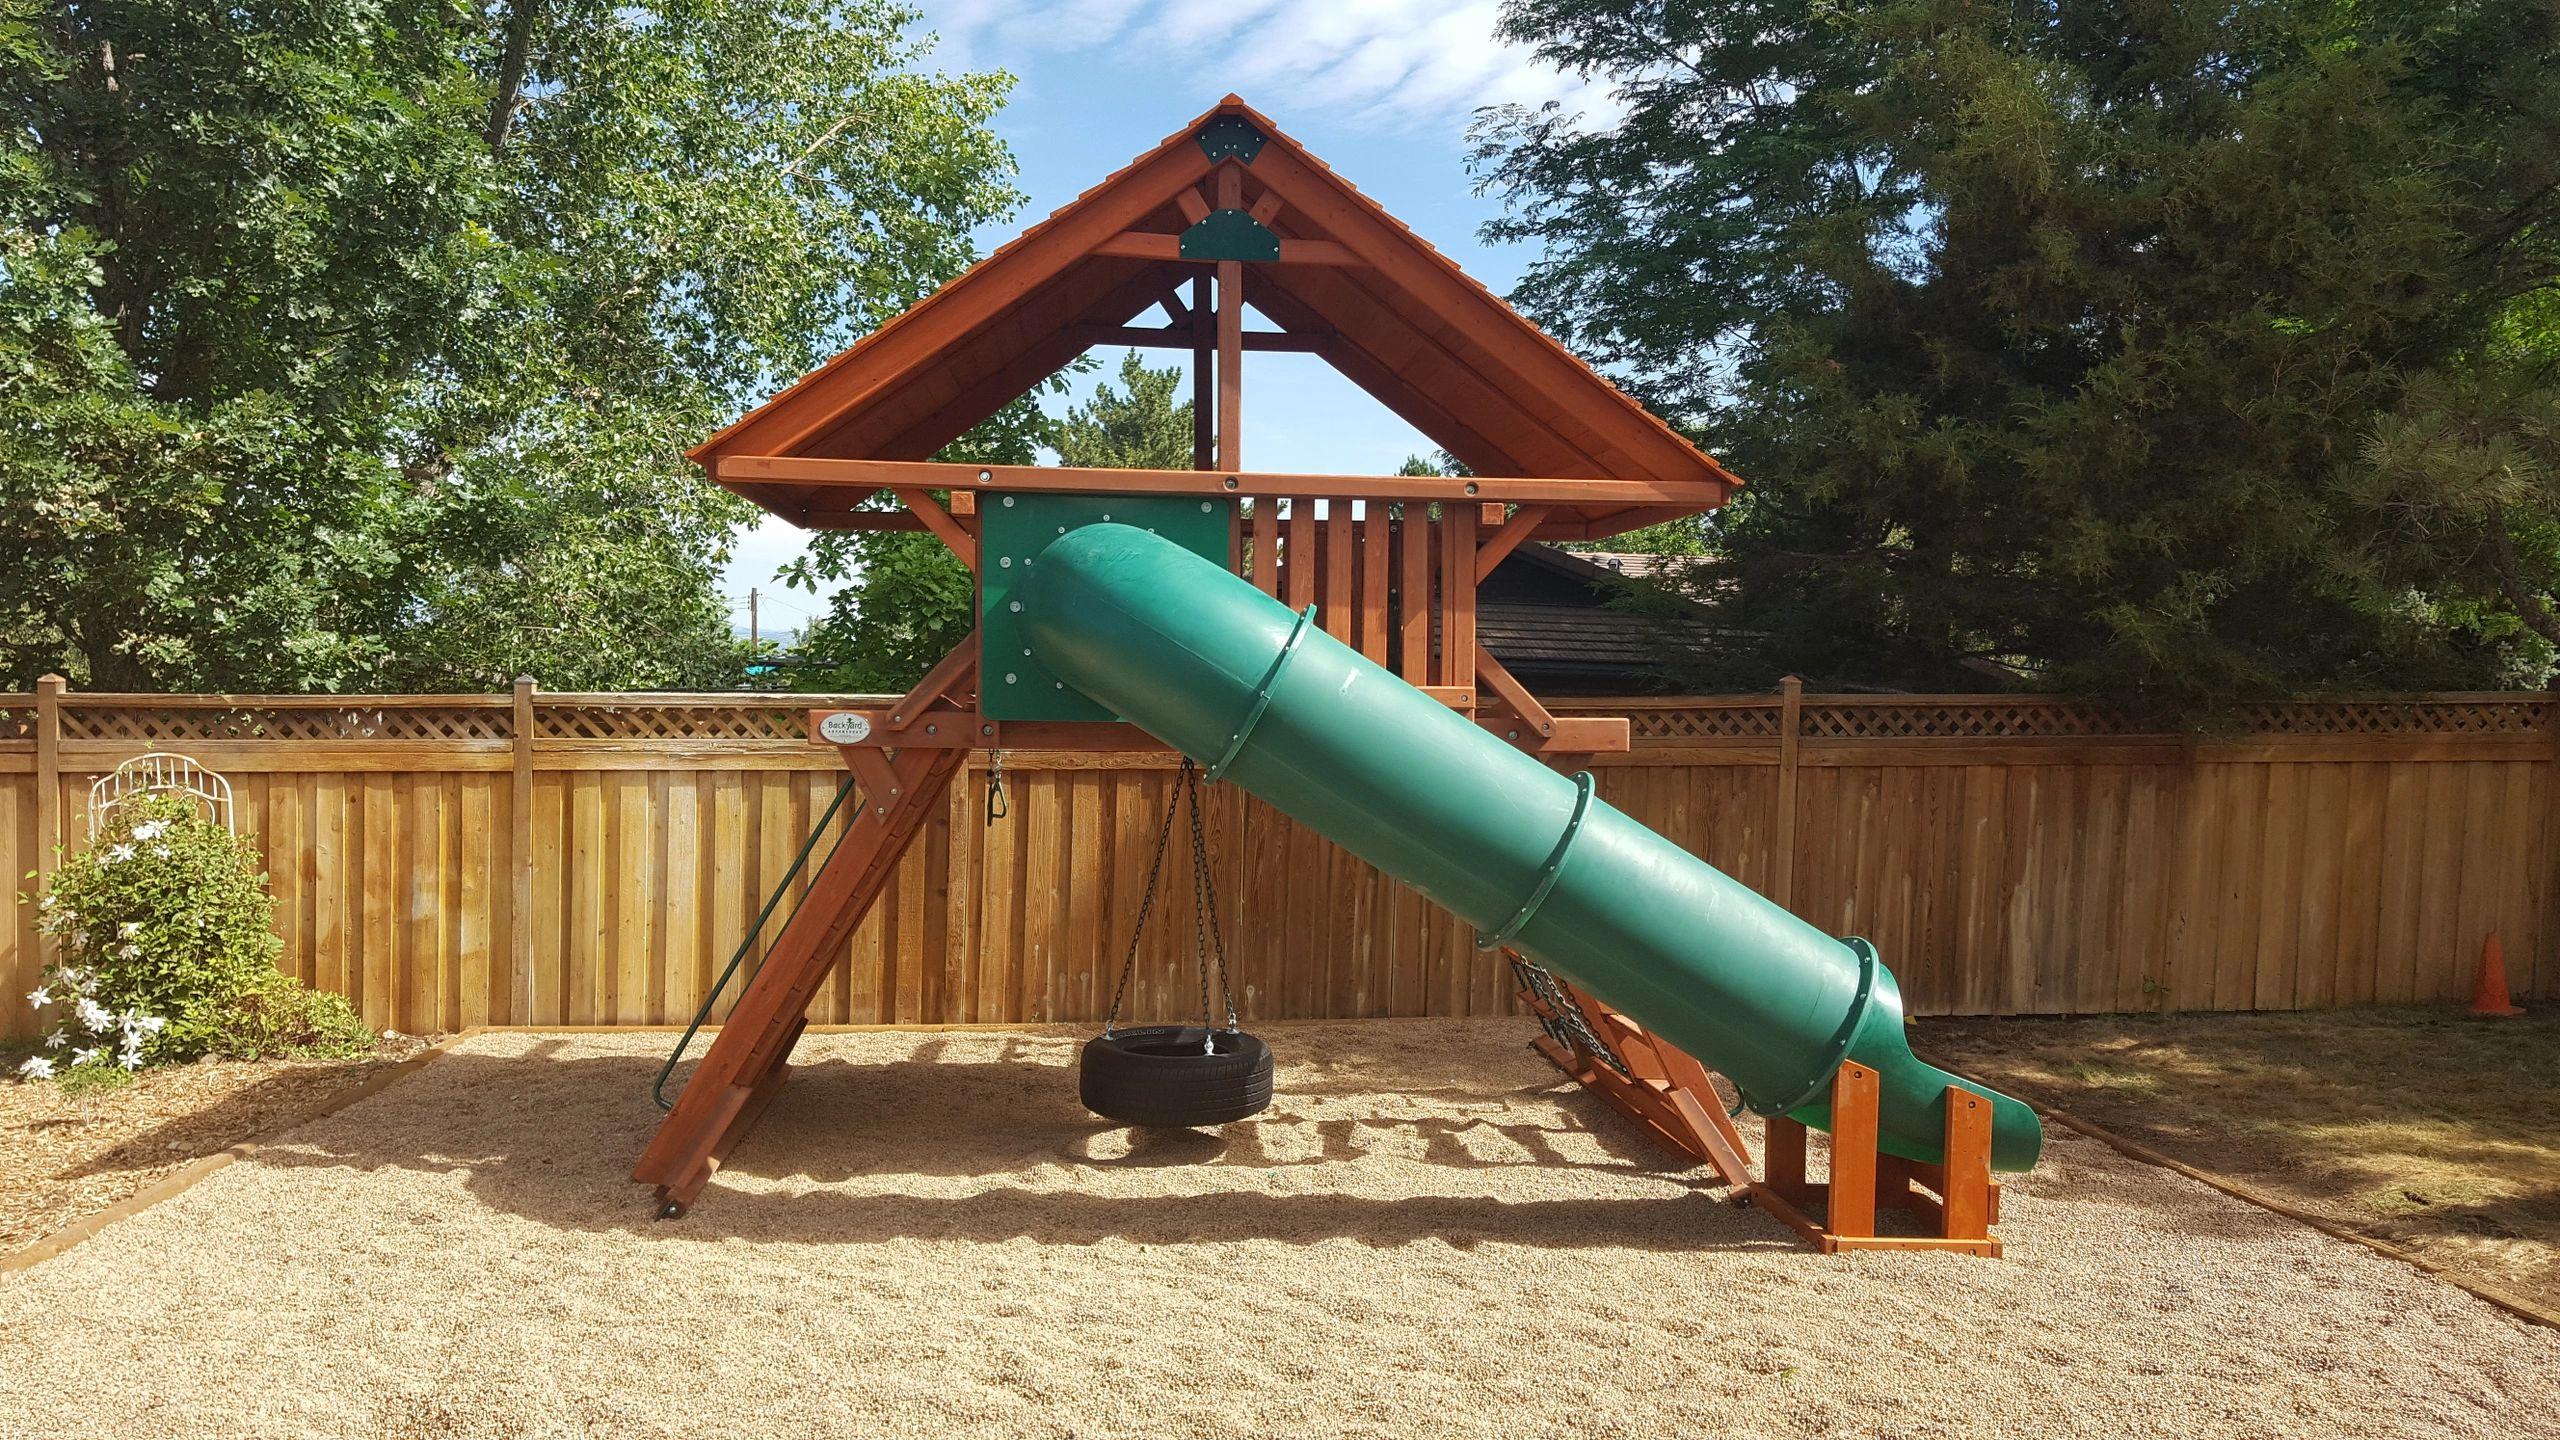 Merveilleux Ultimate Playsets, Inc   Backyard Adventures Of Colorado